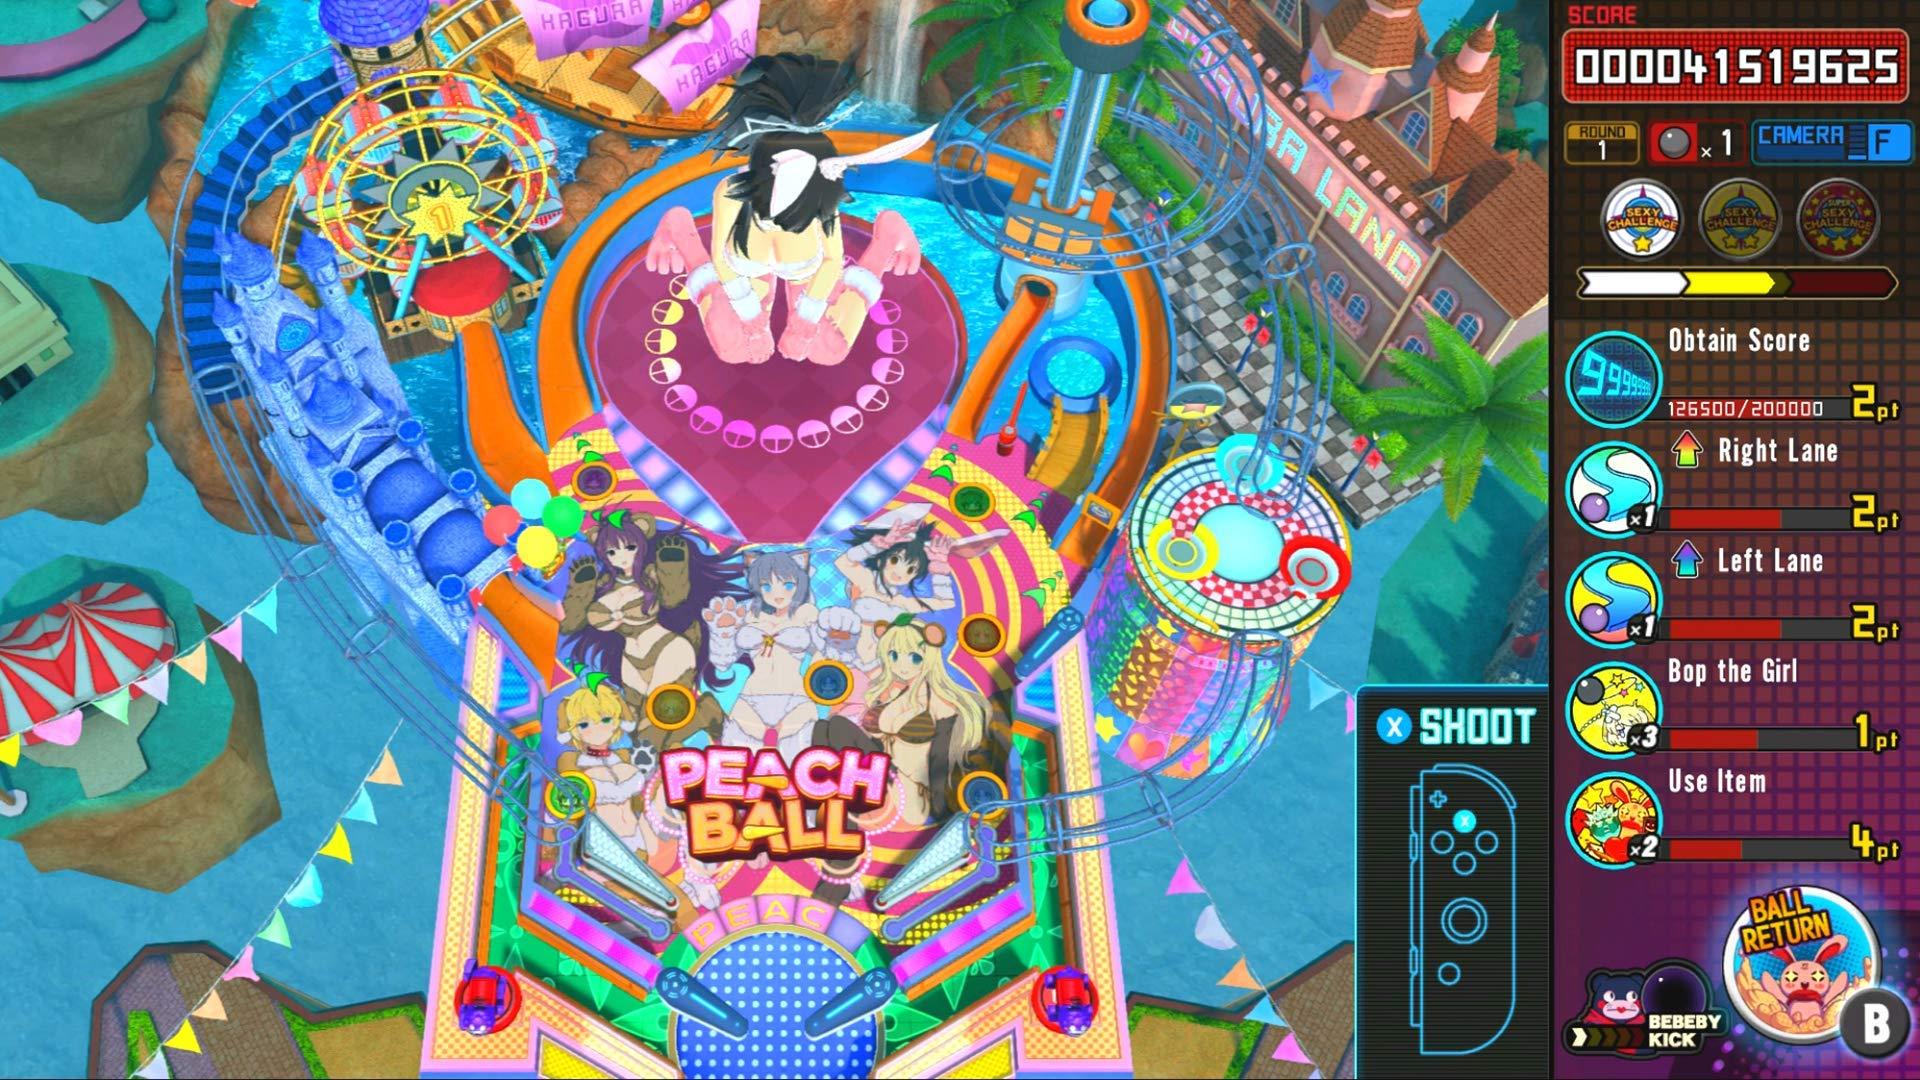 Senran Kagura Peach Ball - Nintendo Switch by Xseed (Image #11)